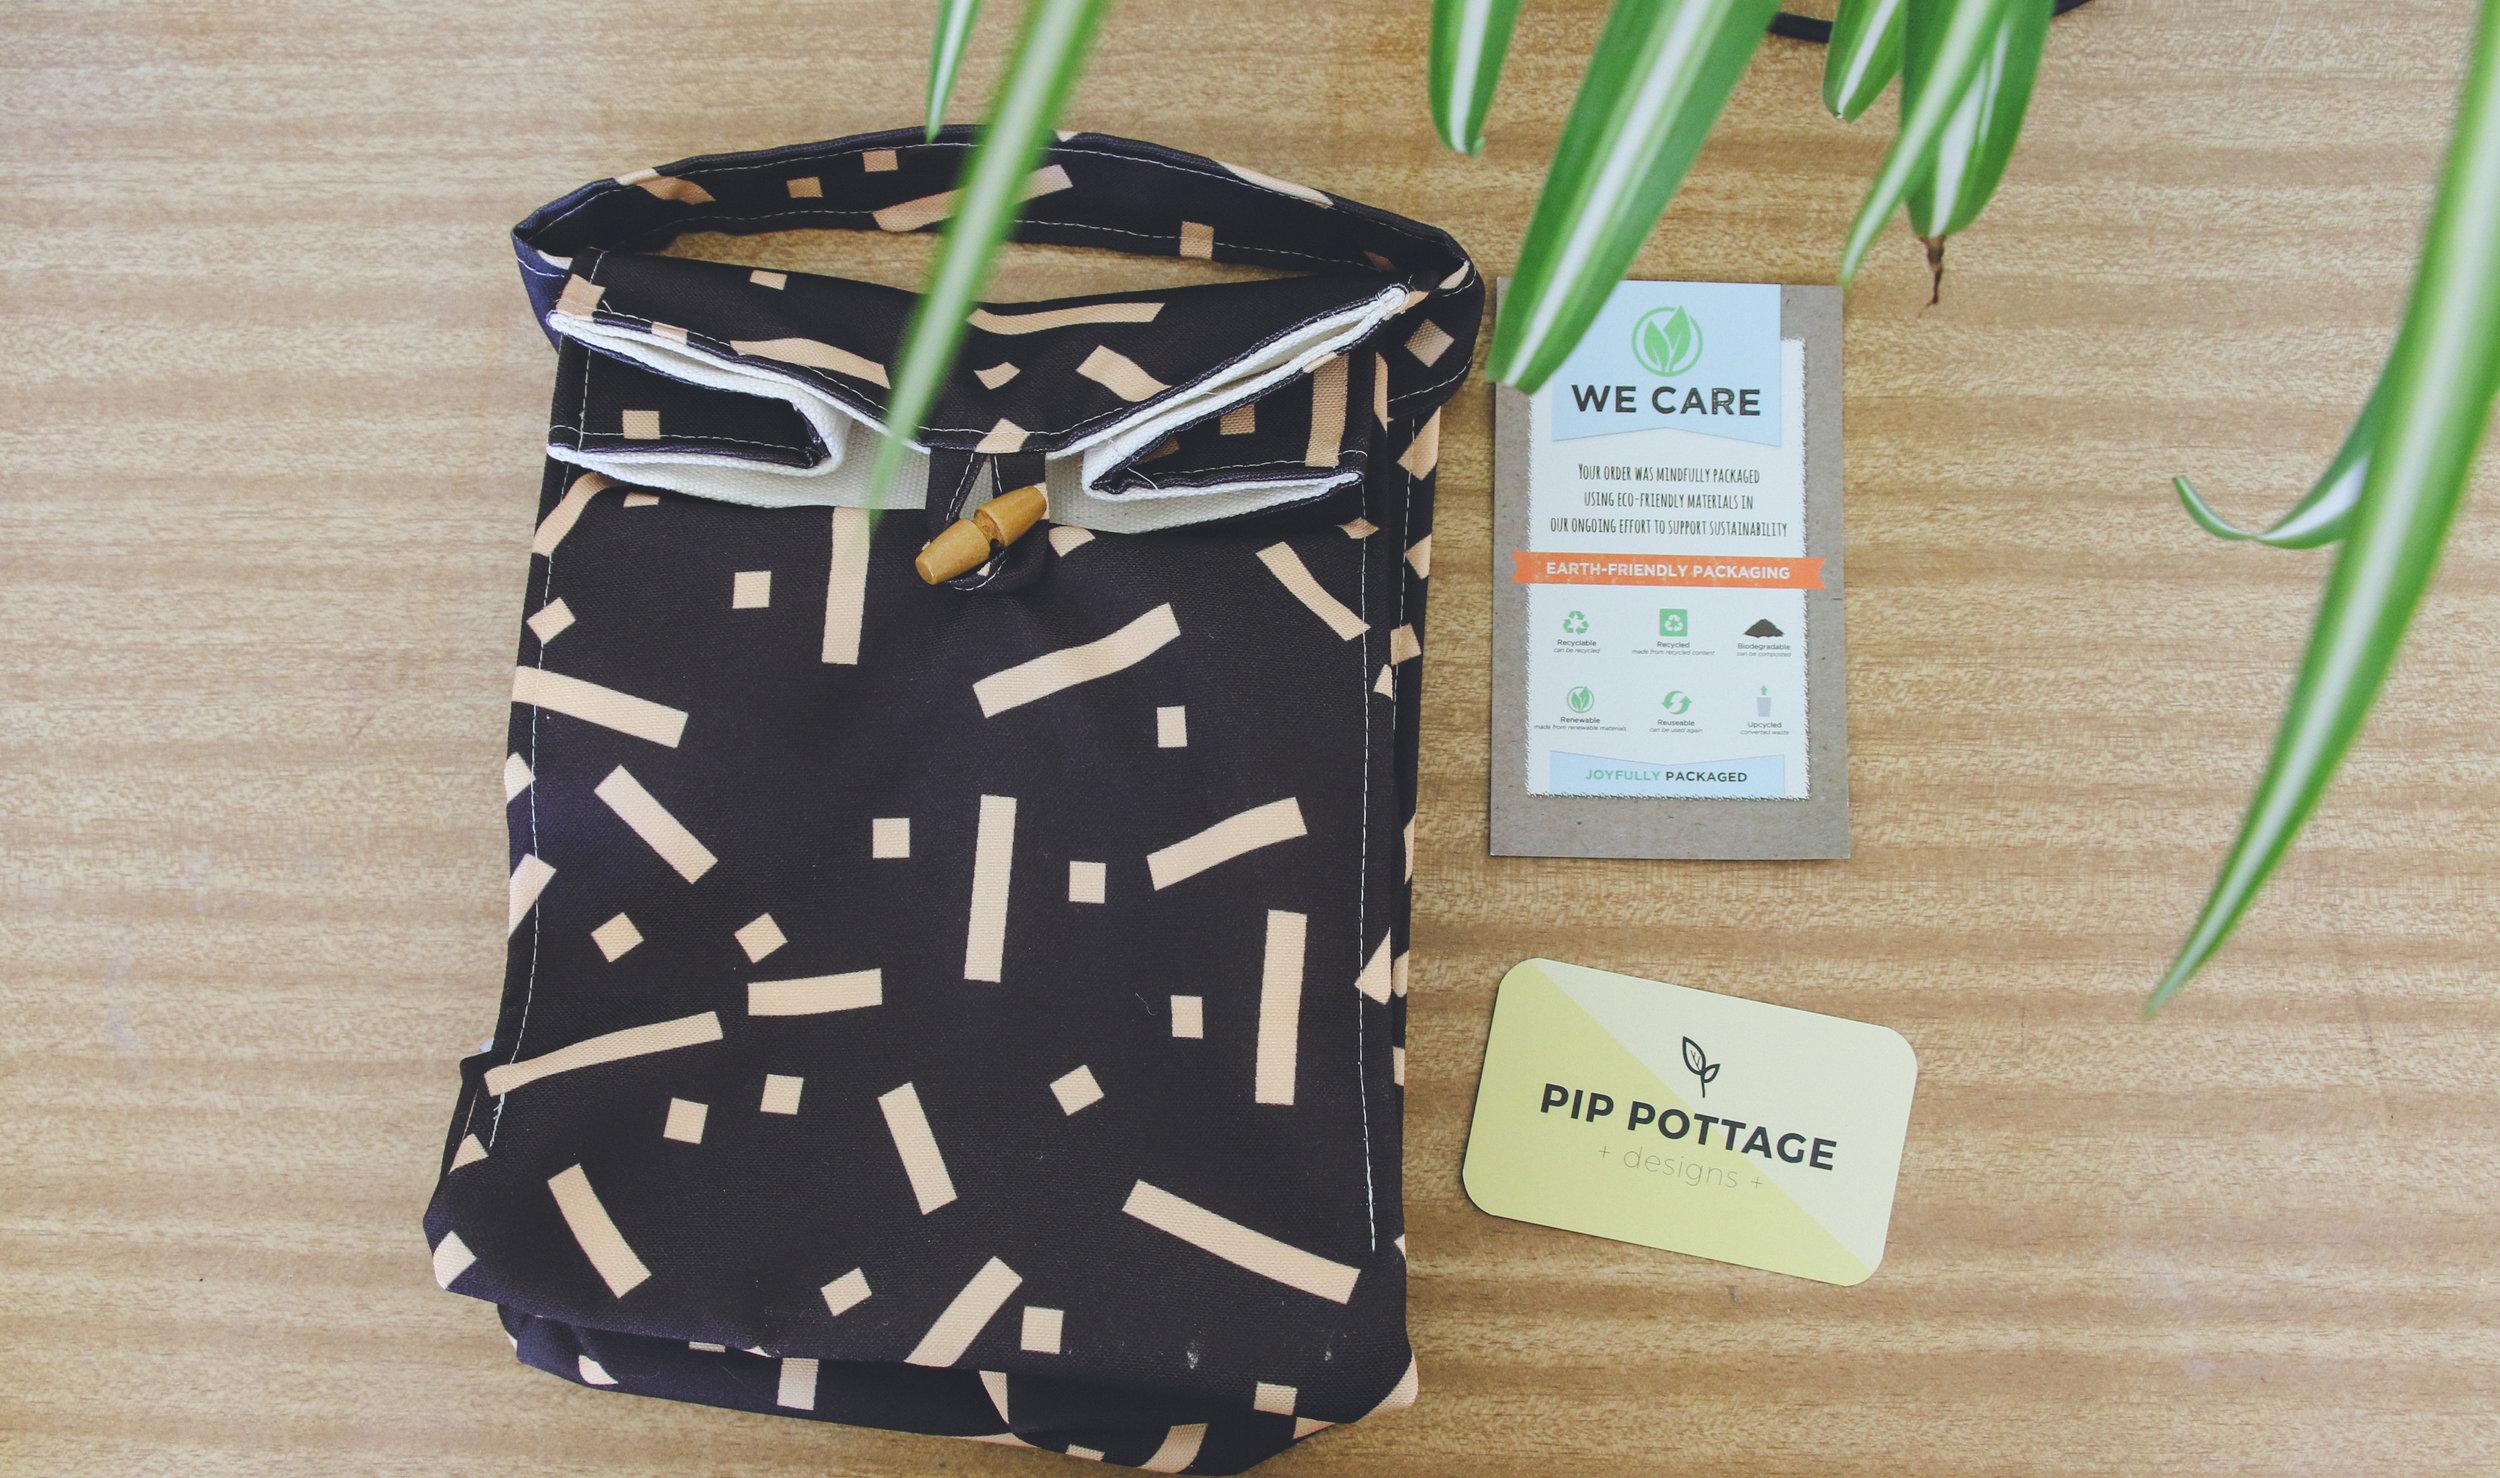 Pip Pottage Designs